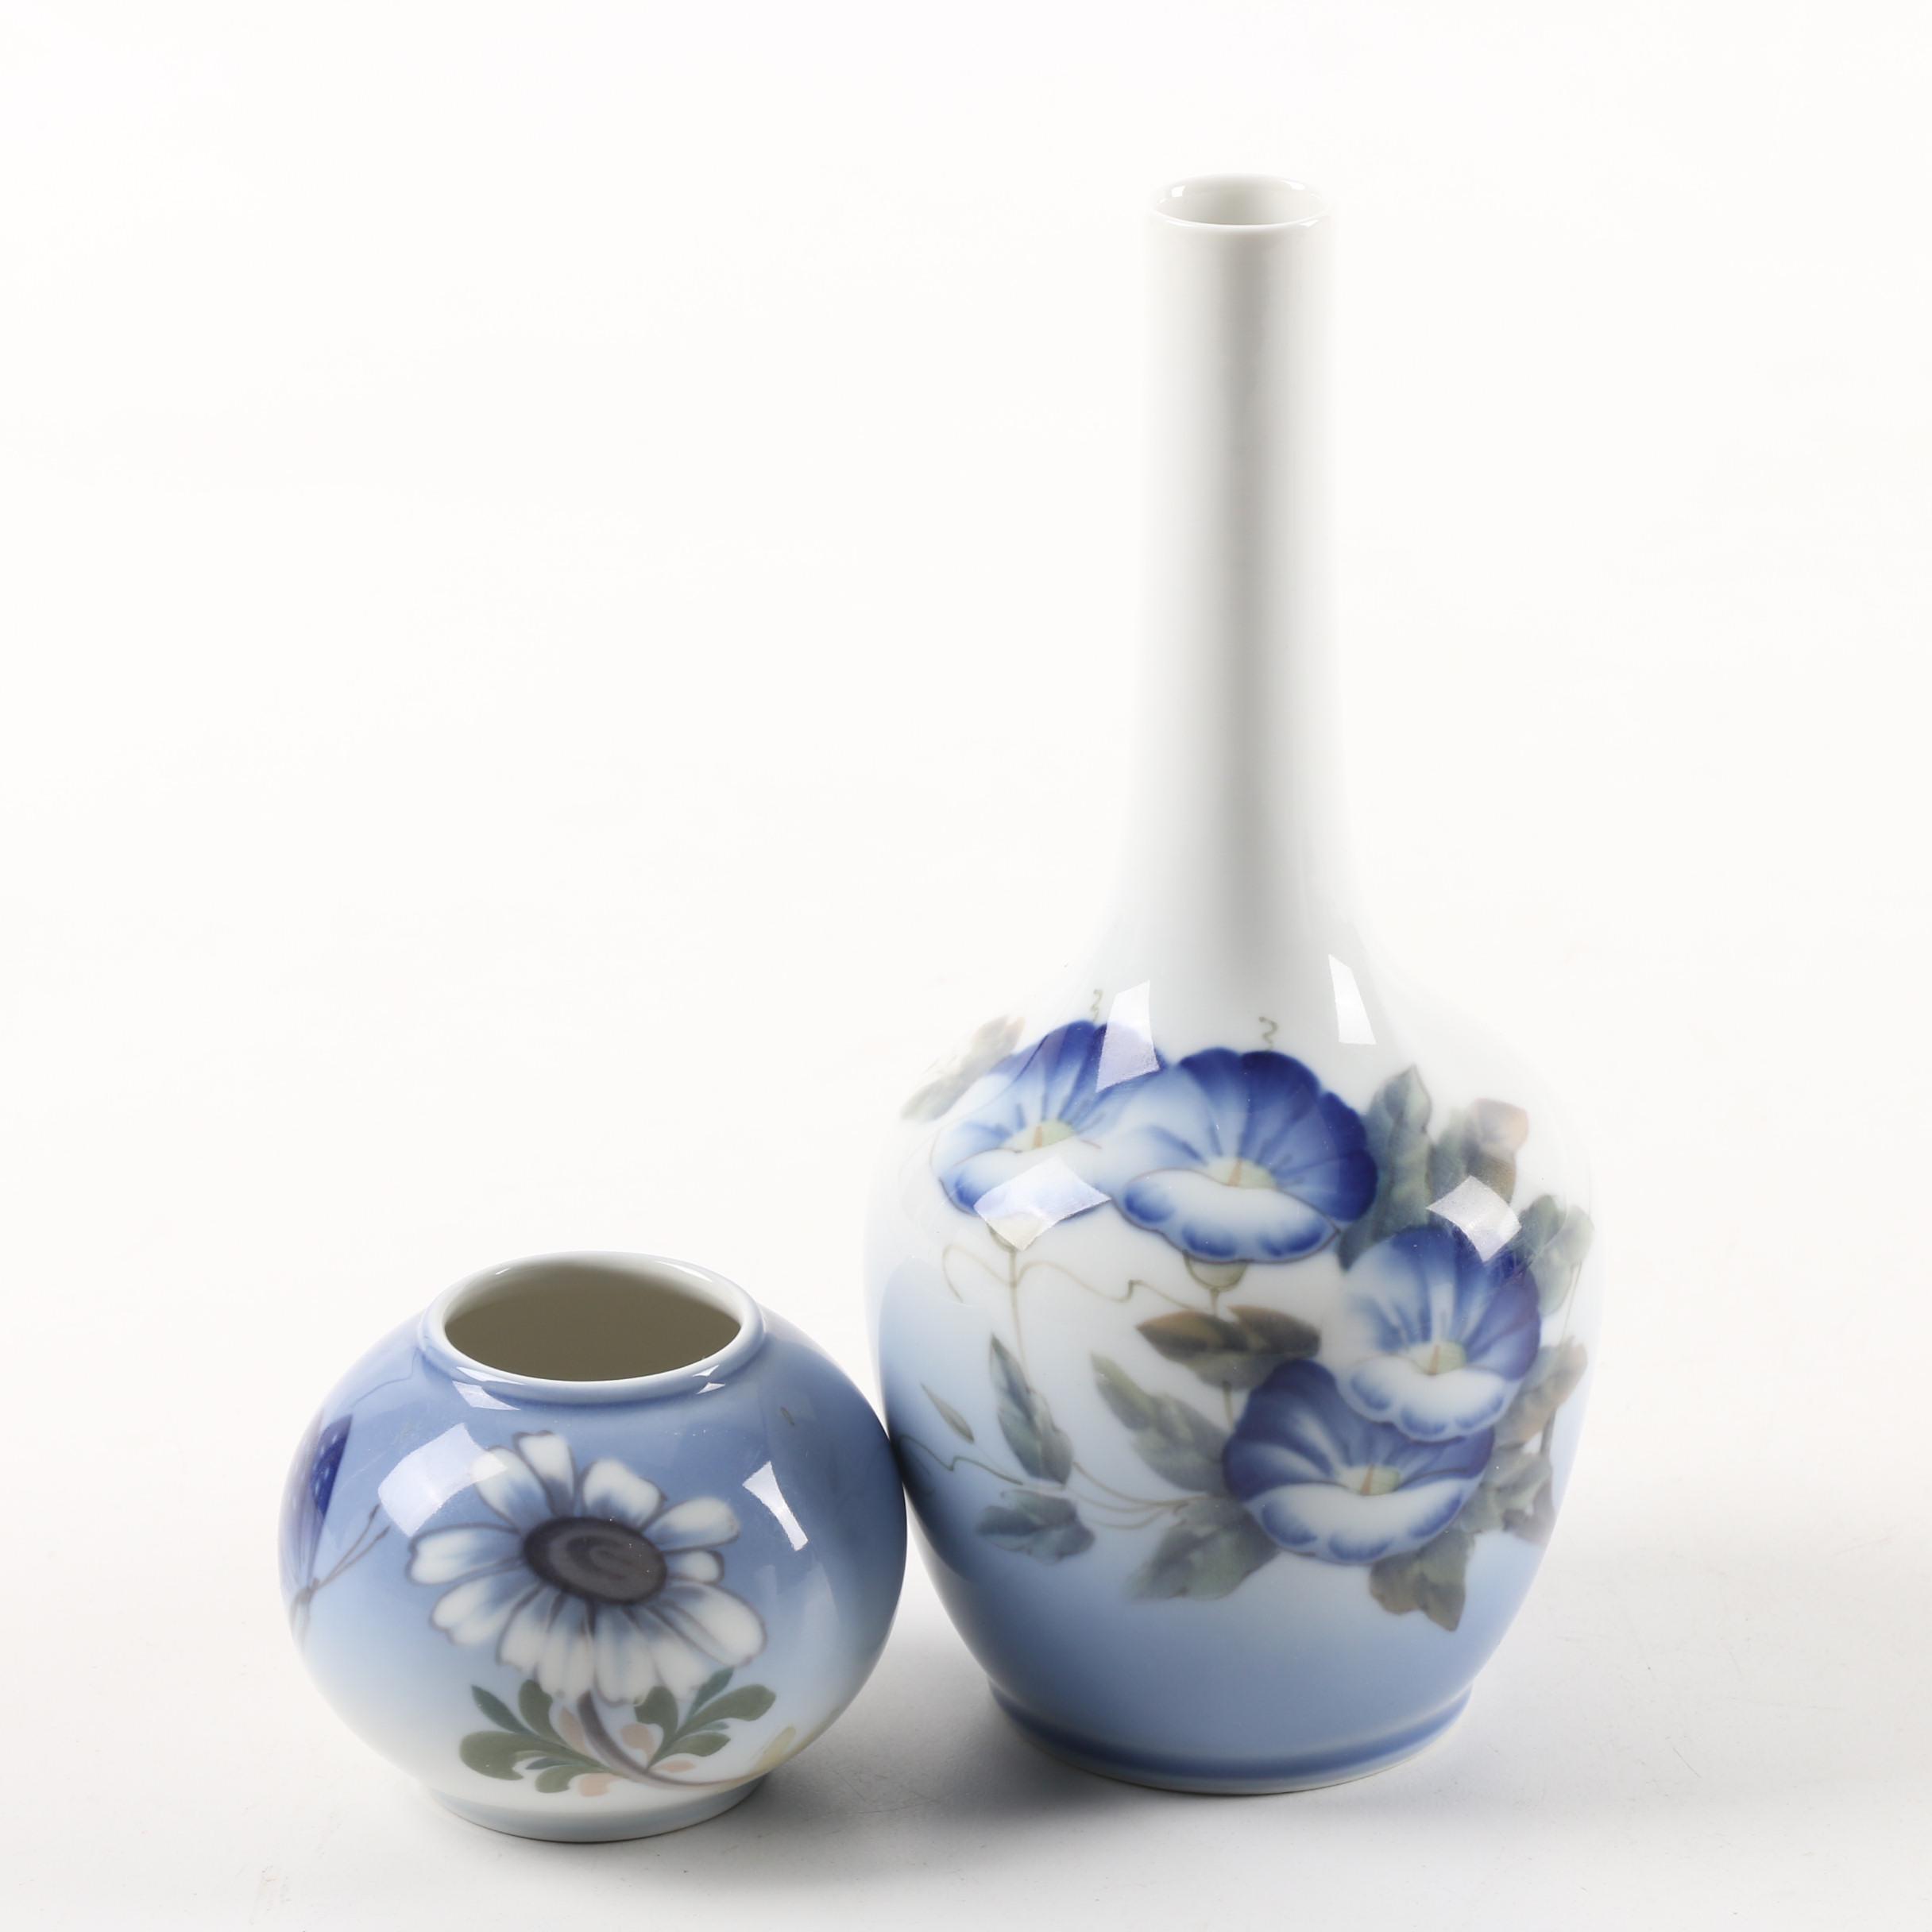 Royal Copenhagen Hand-Painted Floral Themed Porcelain Vases